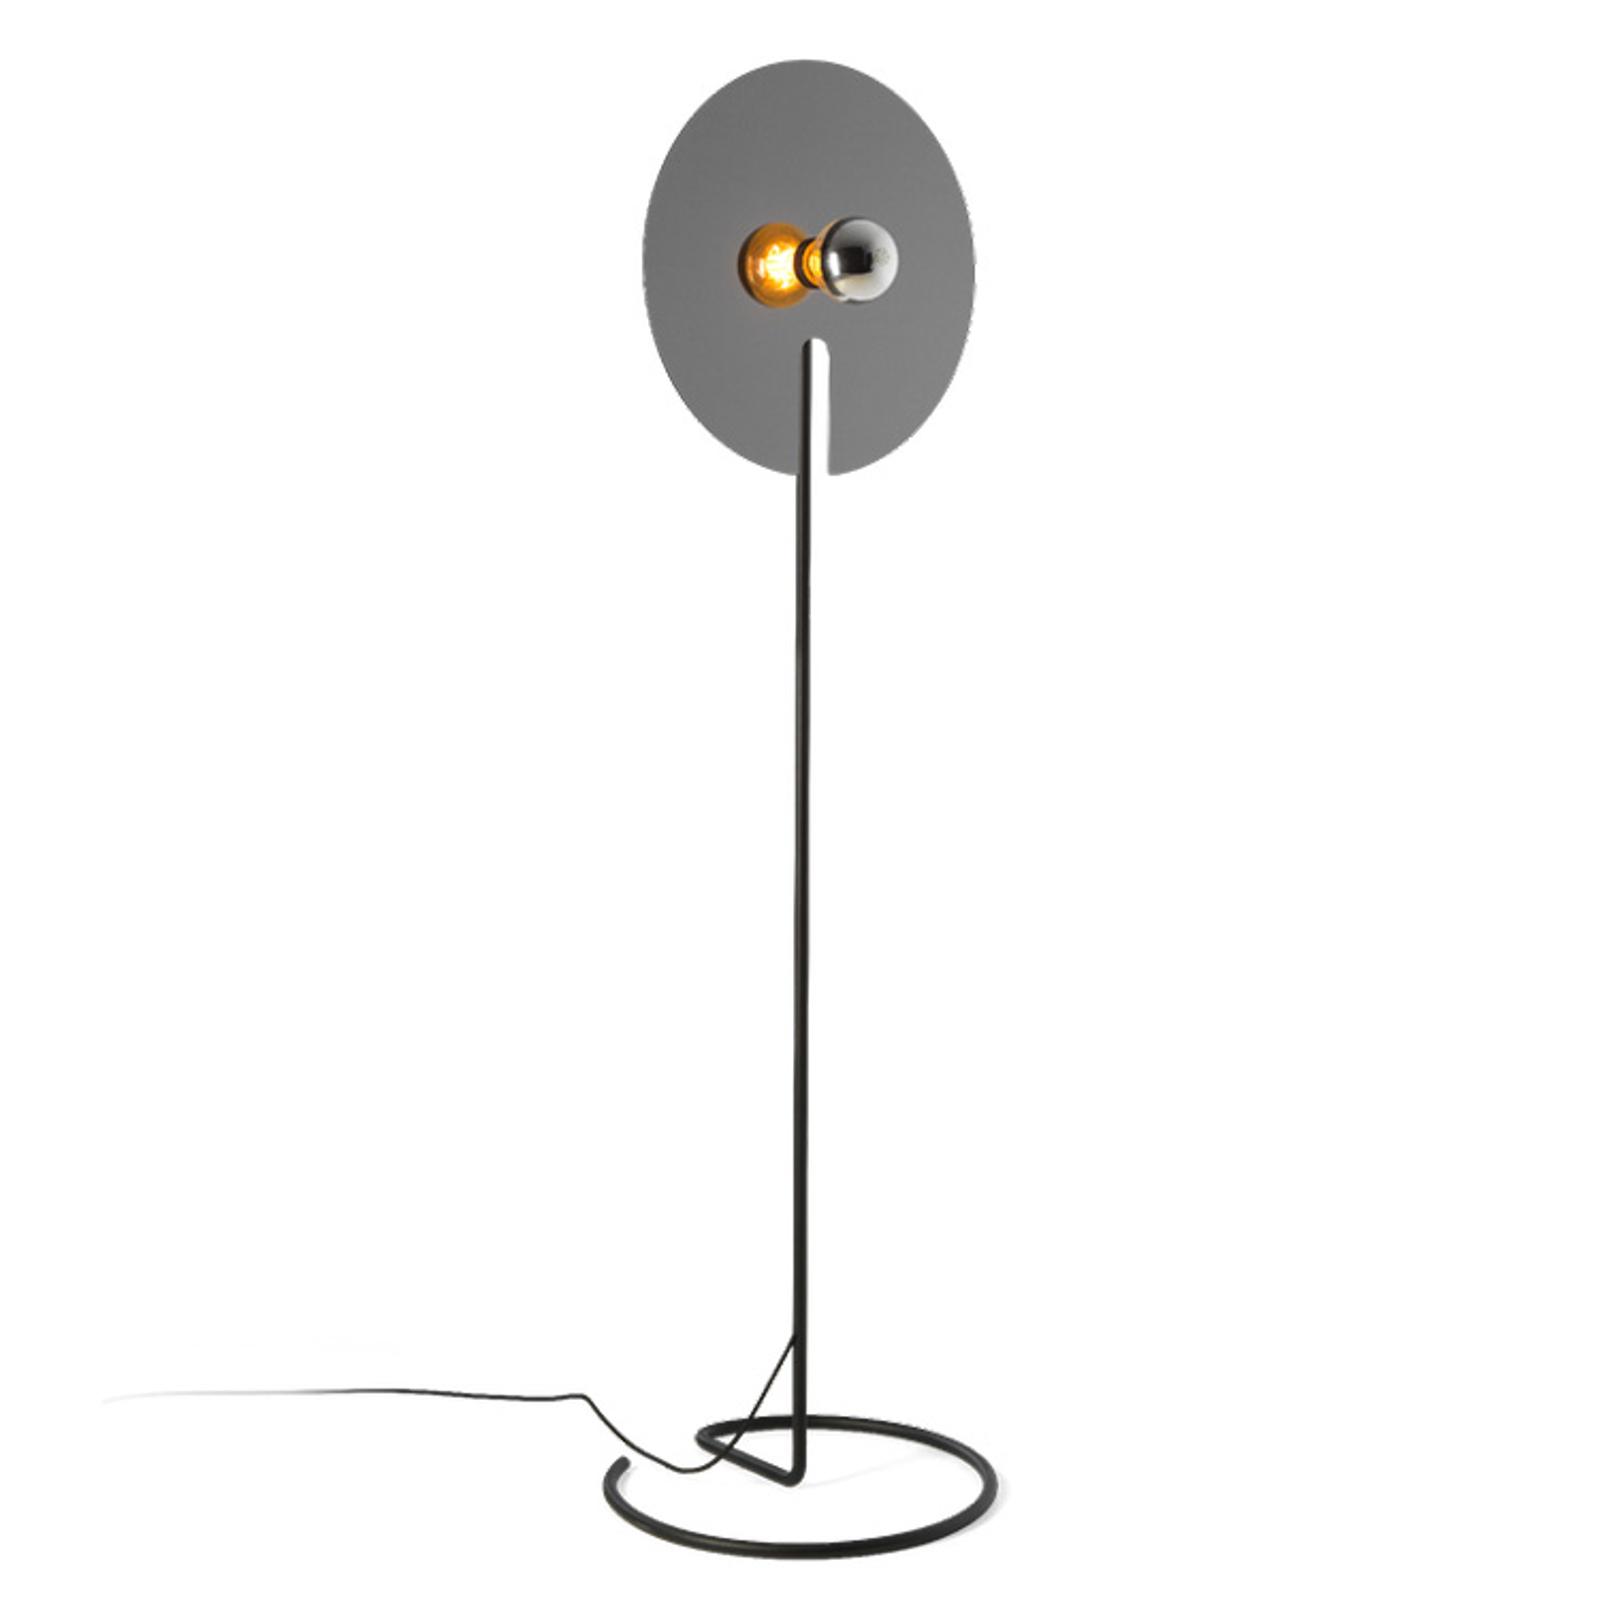 WEVER & DUCRÉ Mirro Stehlampe 2.0 schwarz/chrom